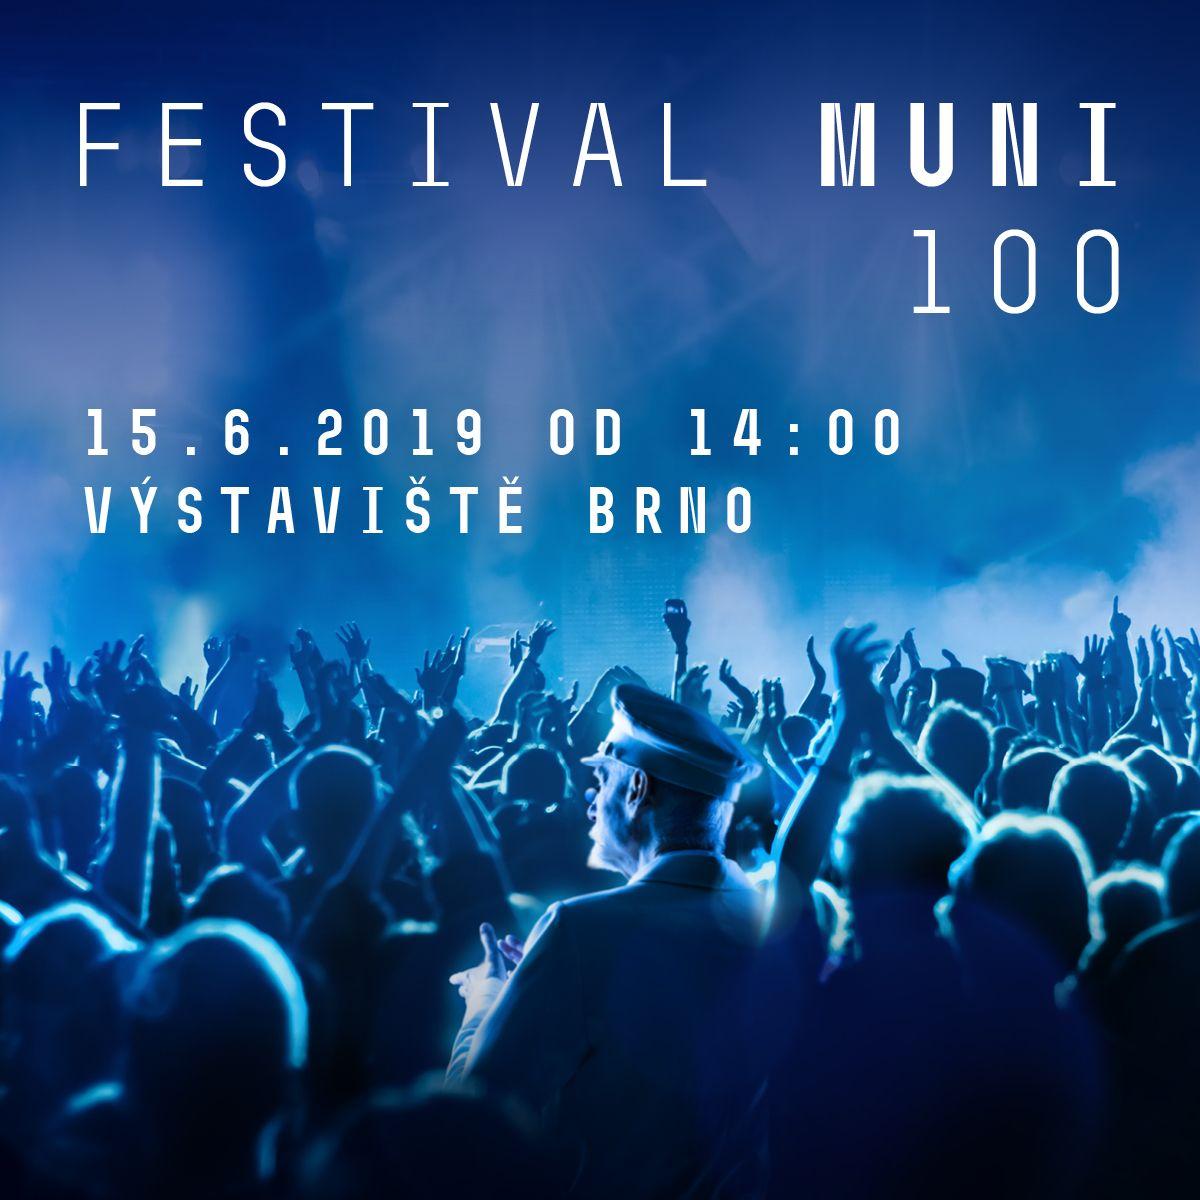 Festival Muni 100